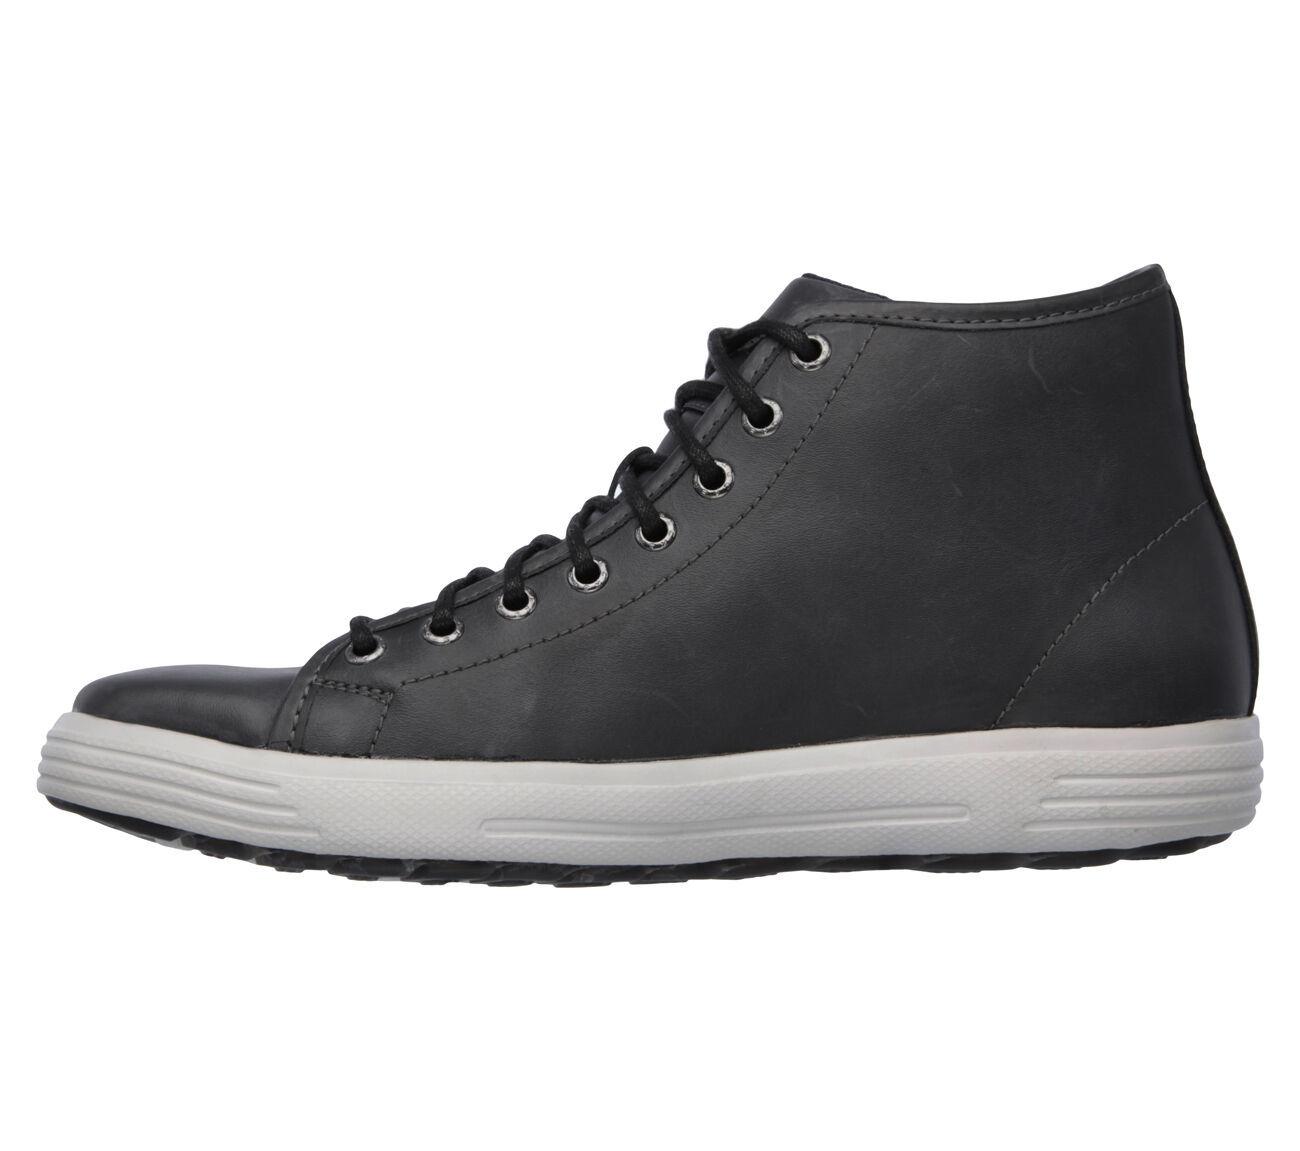 Men's SKECHERS Skech-Air: Porter - Stern Casual Shoe, 64742 BLK Sizes 8-10 Blac